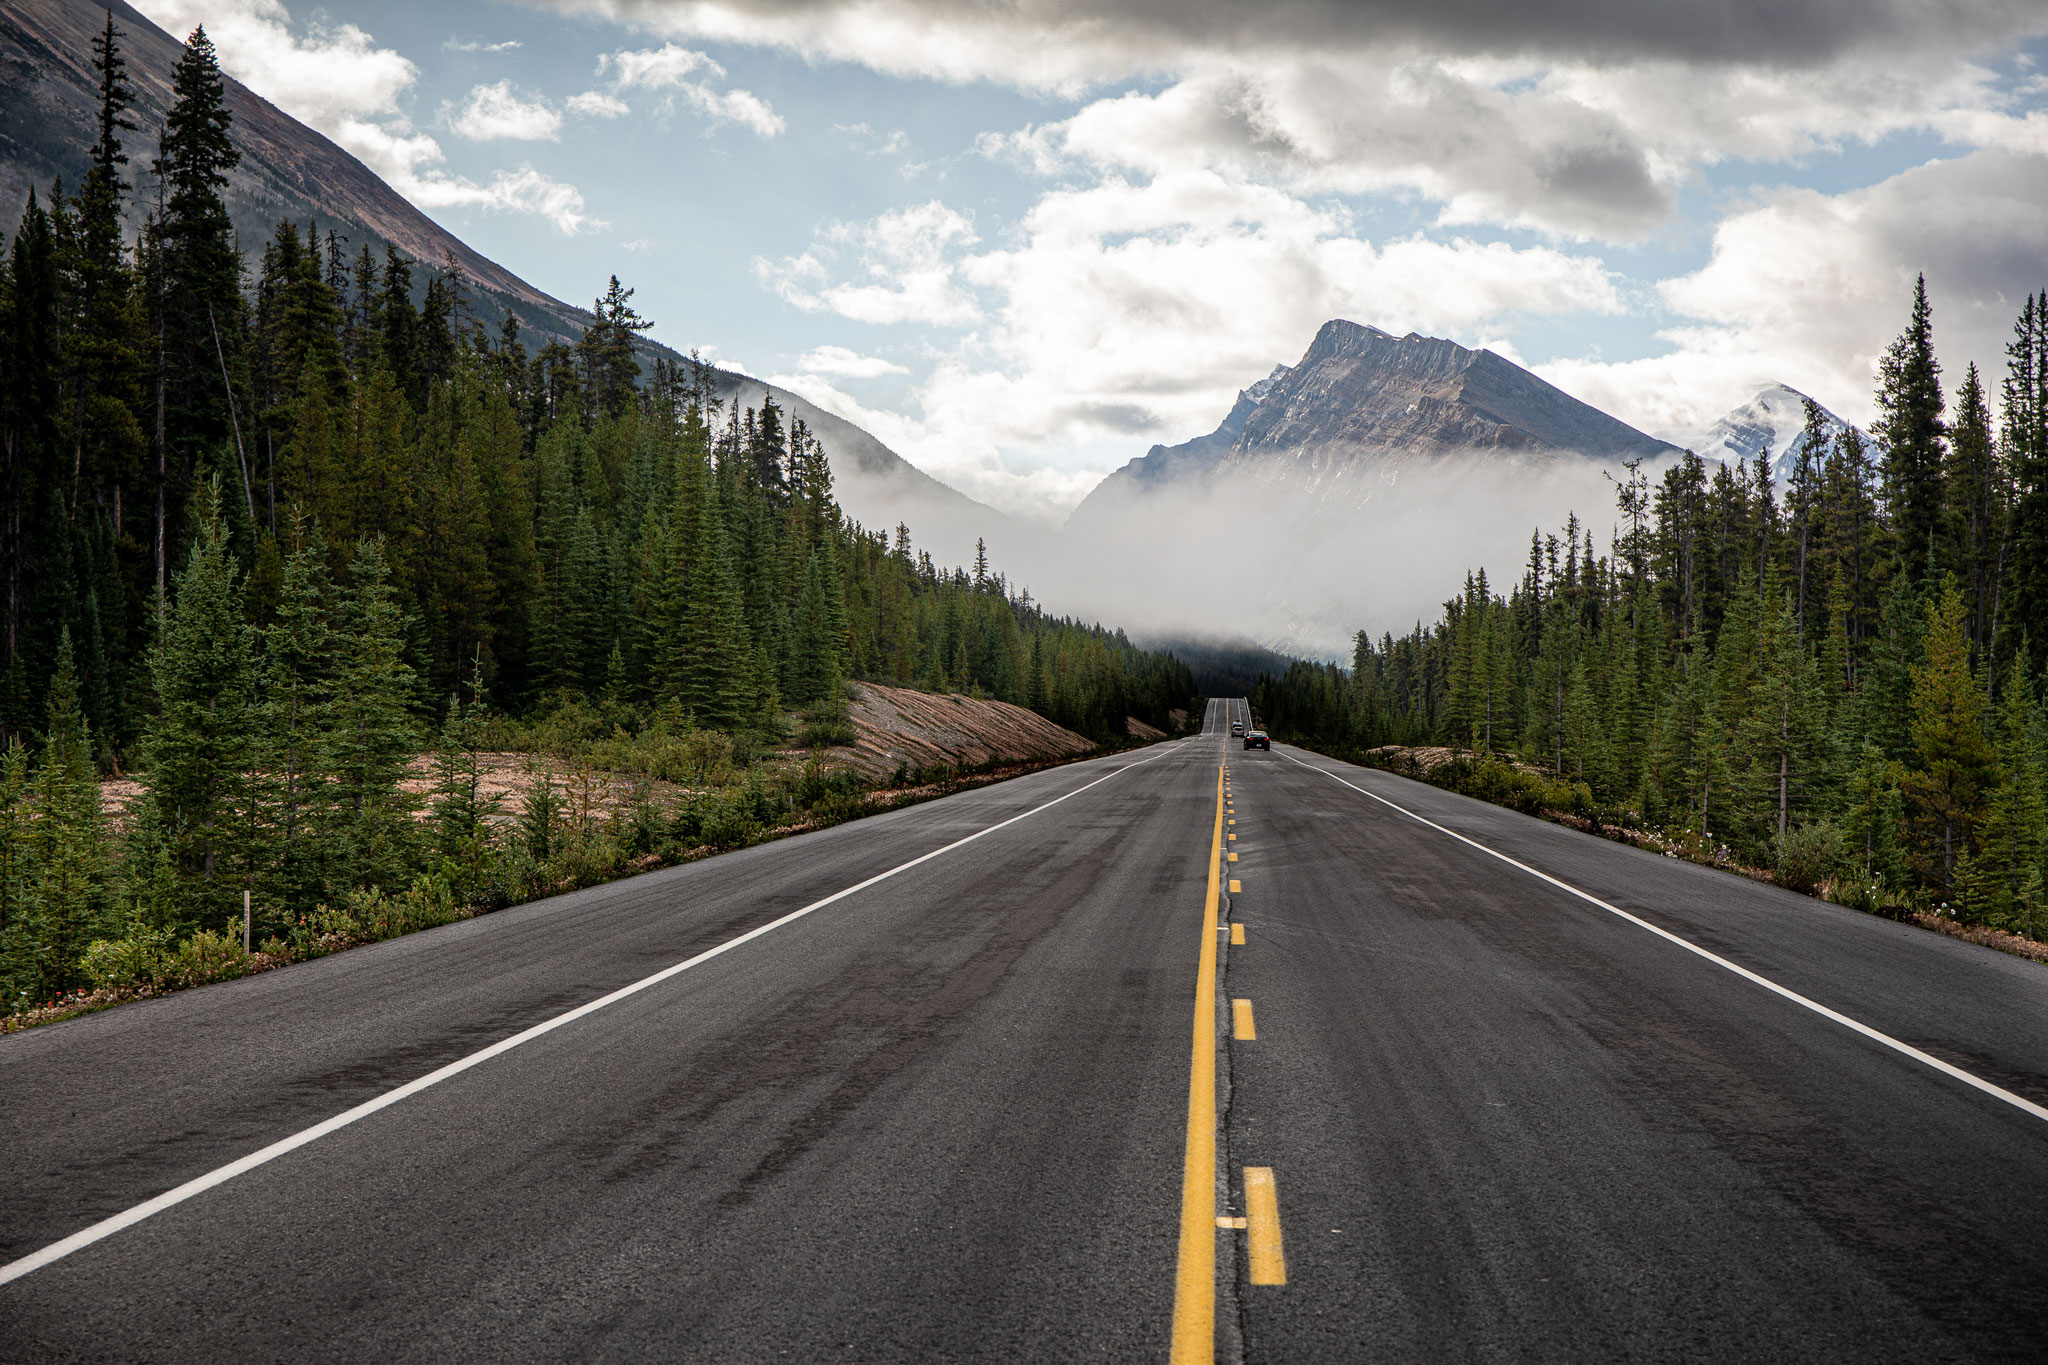 Columbia Icefields Parkway (Foto: Andreas Ochsenkühn)